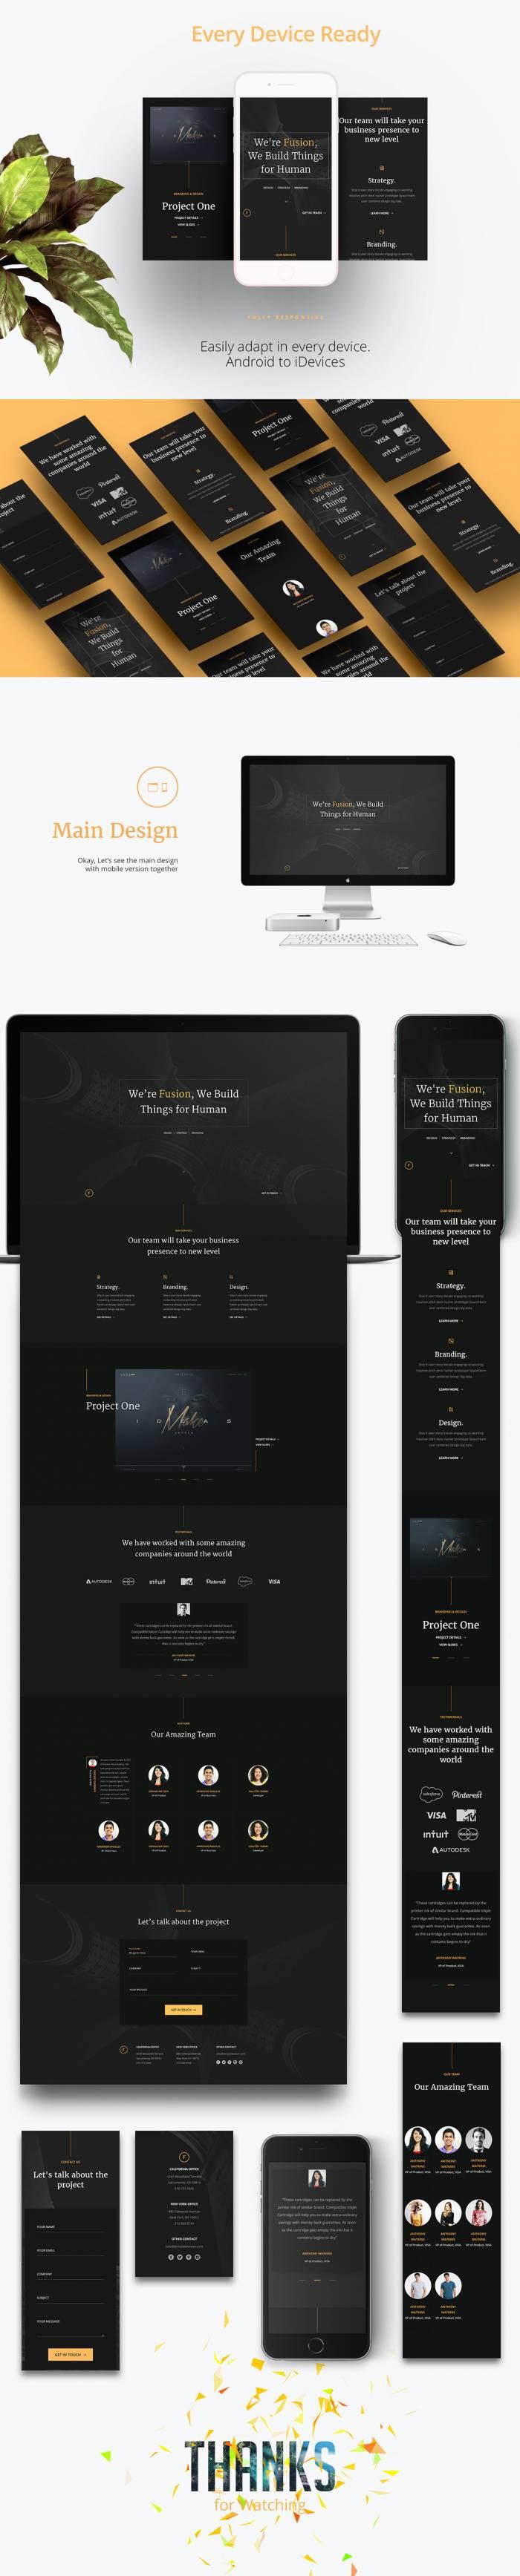 Fusion – Free Portfolio Template (HTML5/CSS3) скачать бесплатно